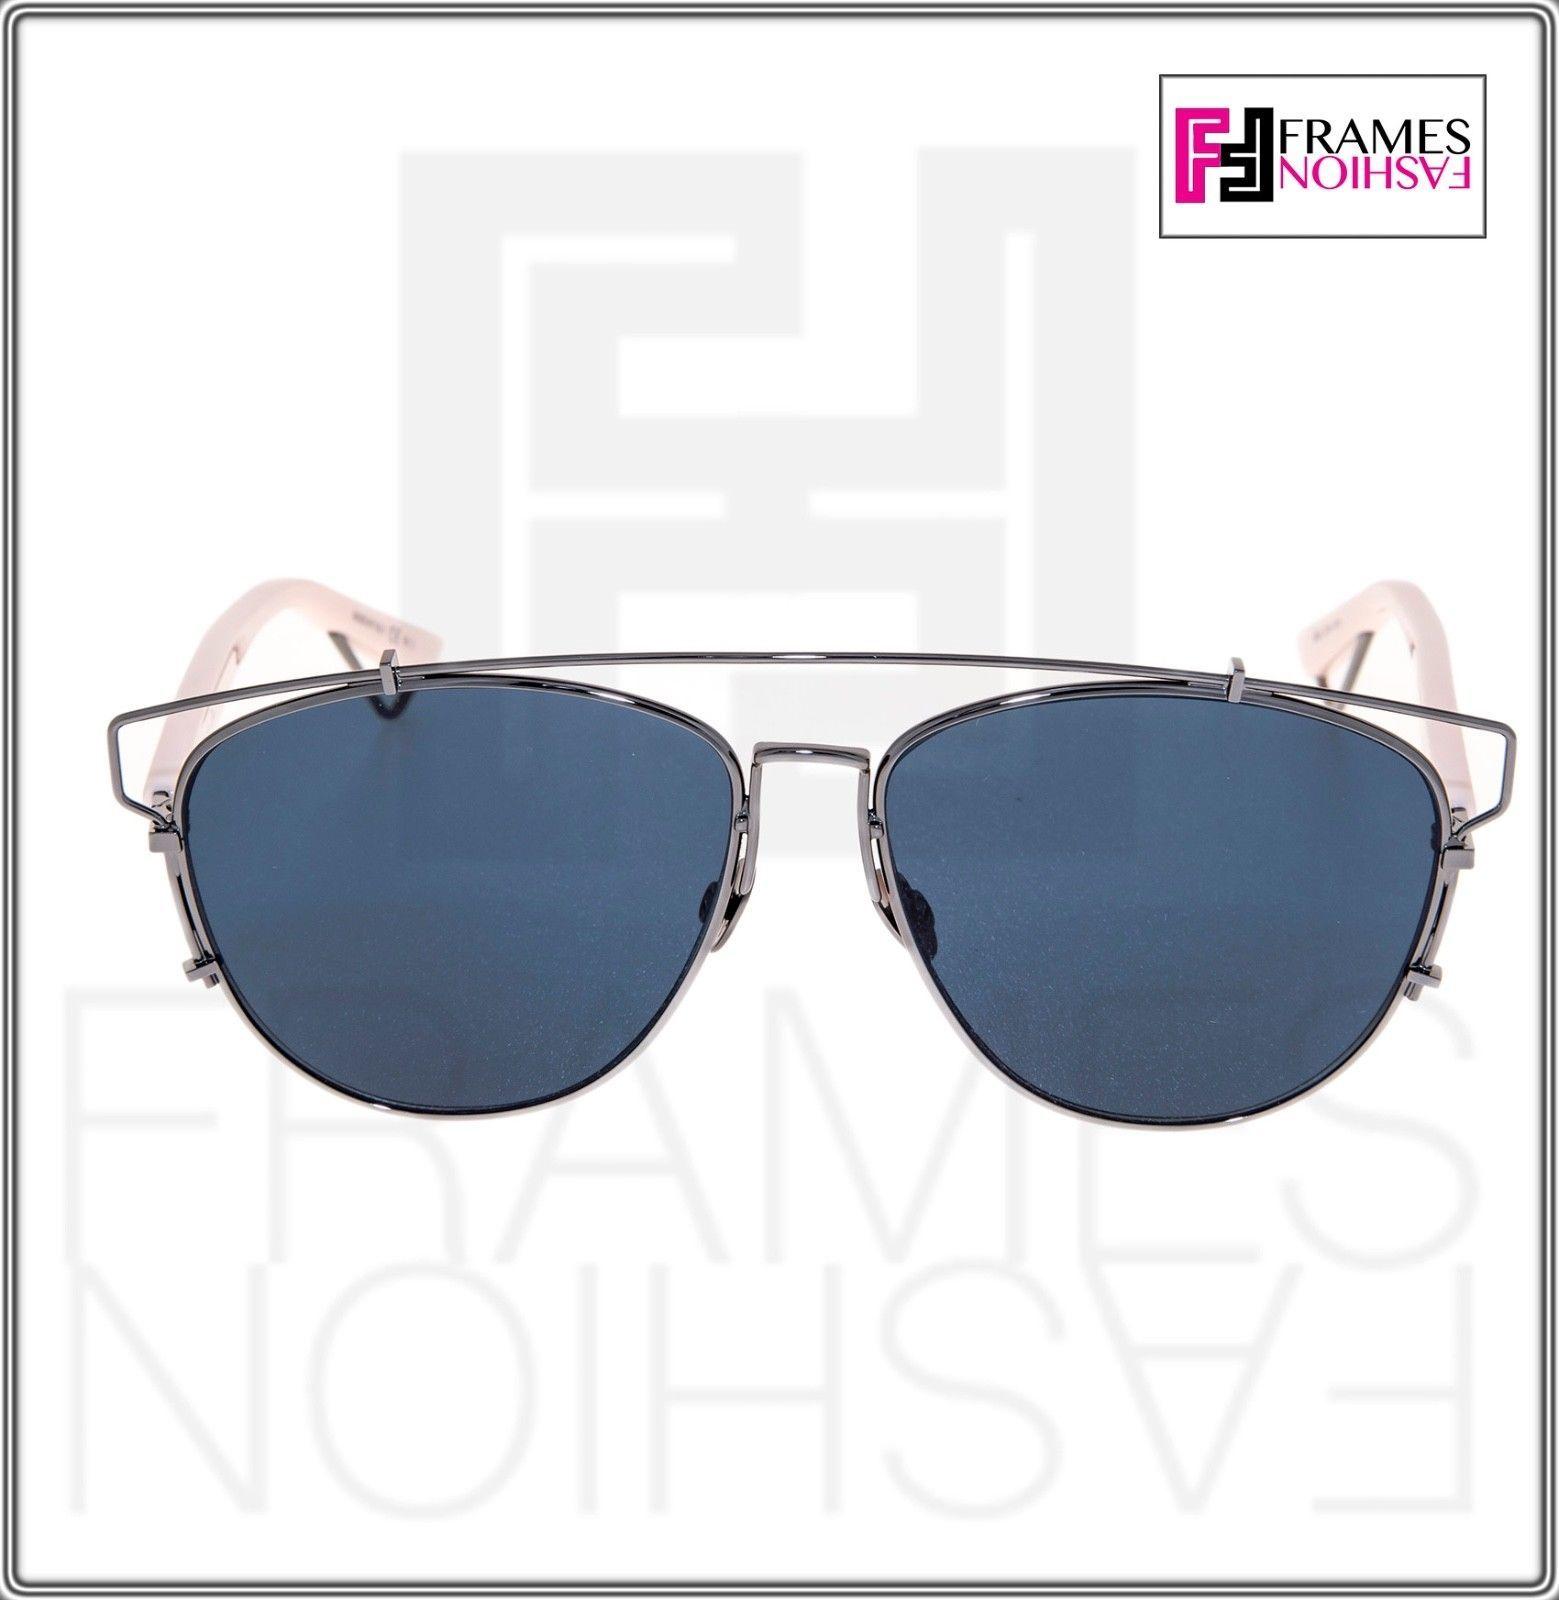 CHRISTIAN DIOR TECHNOLOGIC Ruthenium Pink Blue Flat Sunglasses DIORTECHNOLOGIC